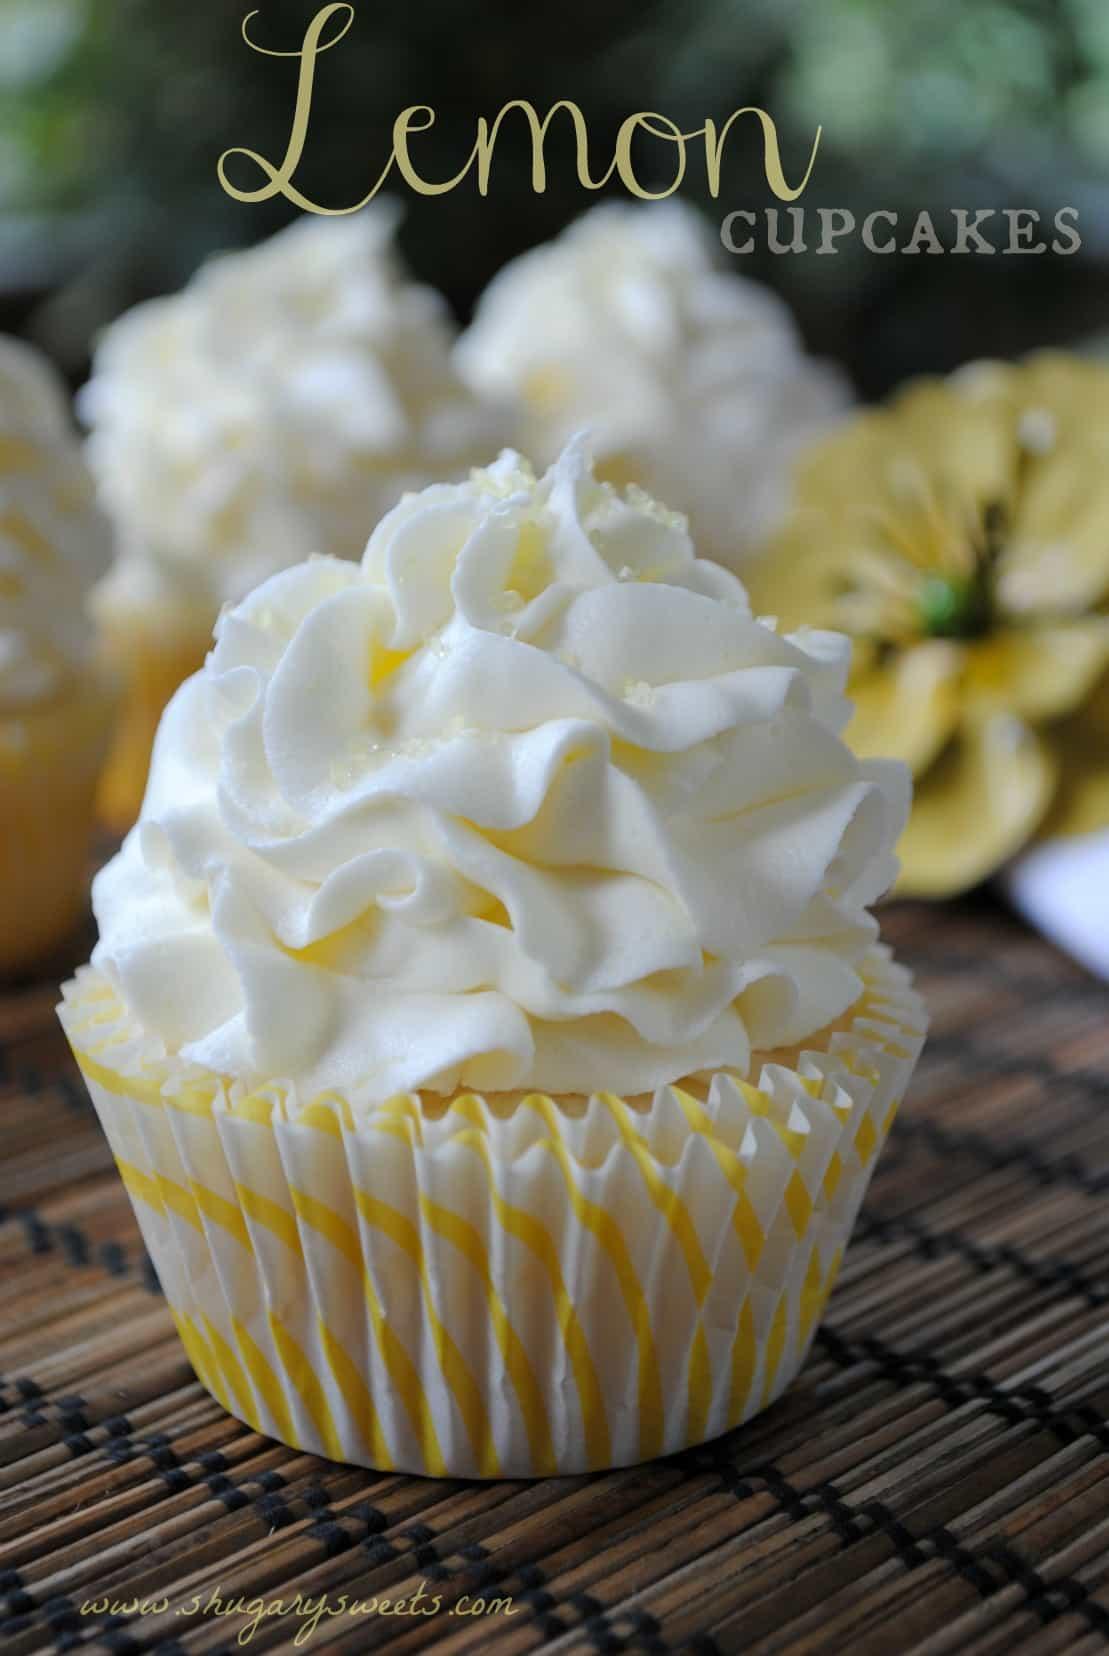 Lemon Cupcakes with Lemon Buttercream from www.shugarysweets.com # ...